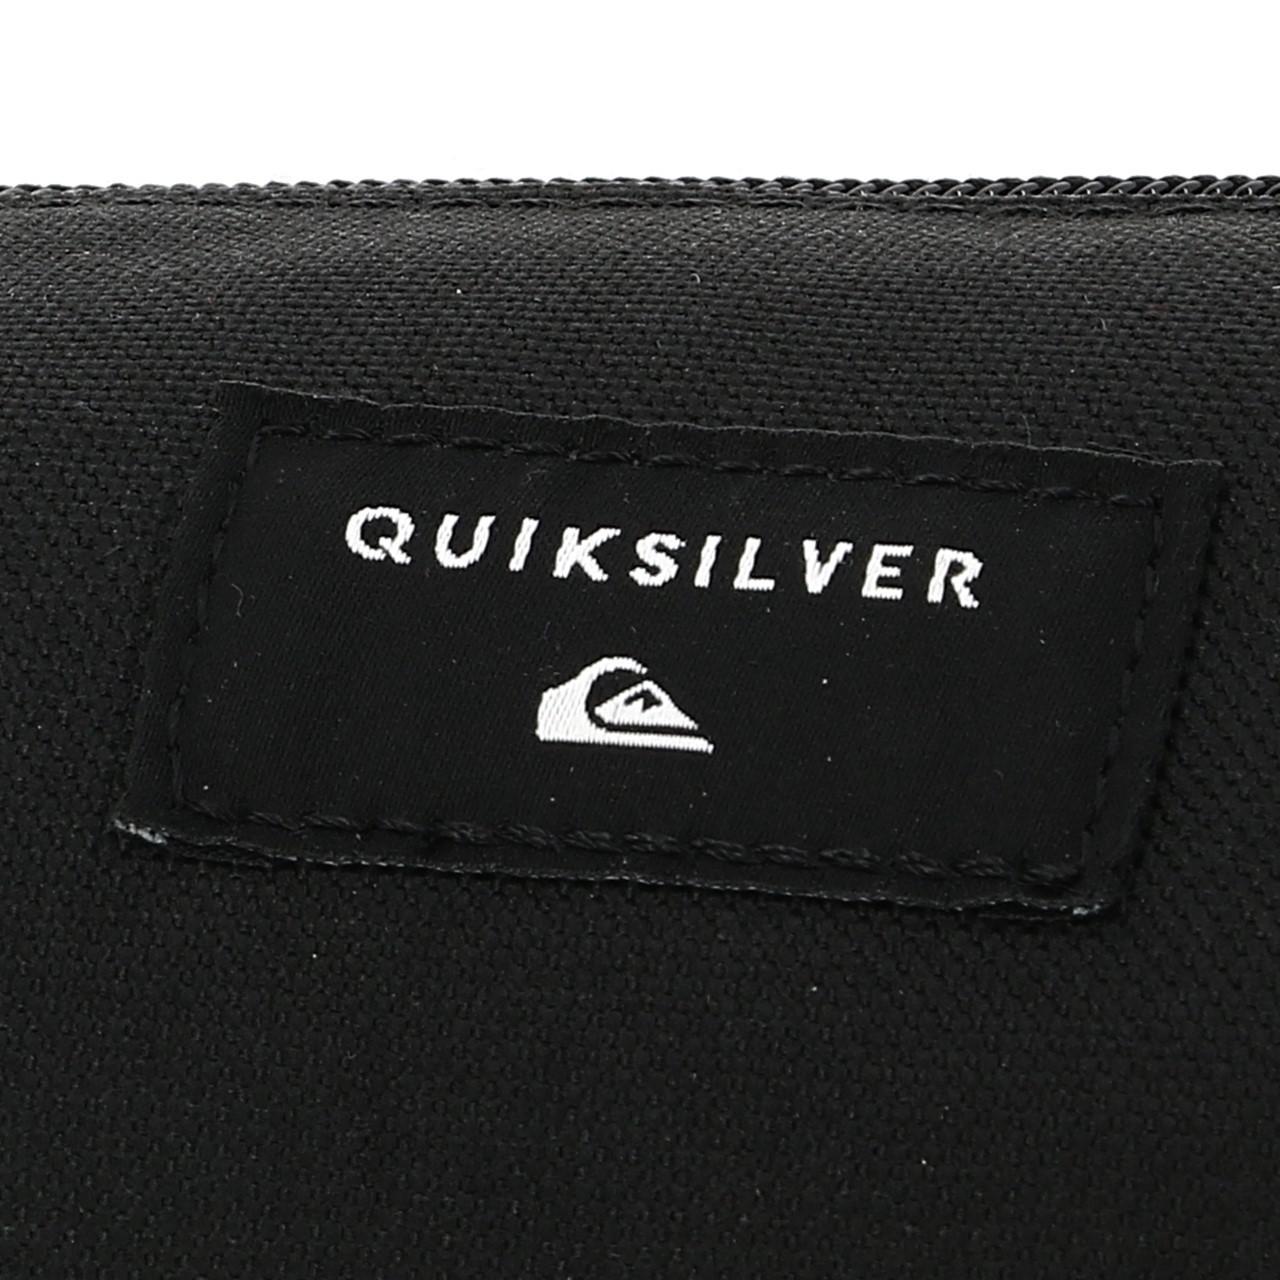 Kit-to-Pencils-Quiksilver-Pencilo-Blk-Pencil-Black-27827-New thumbnail 2